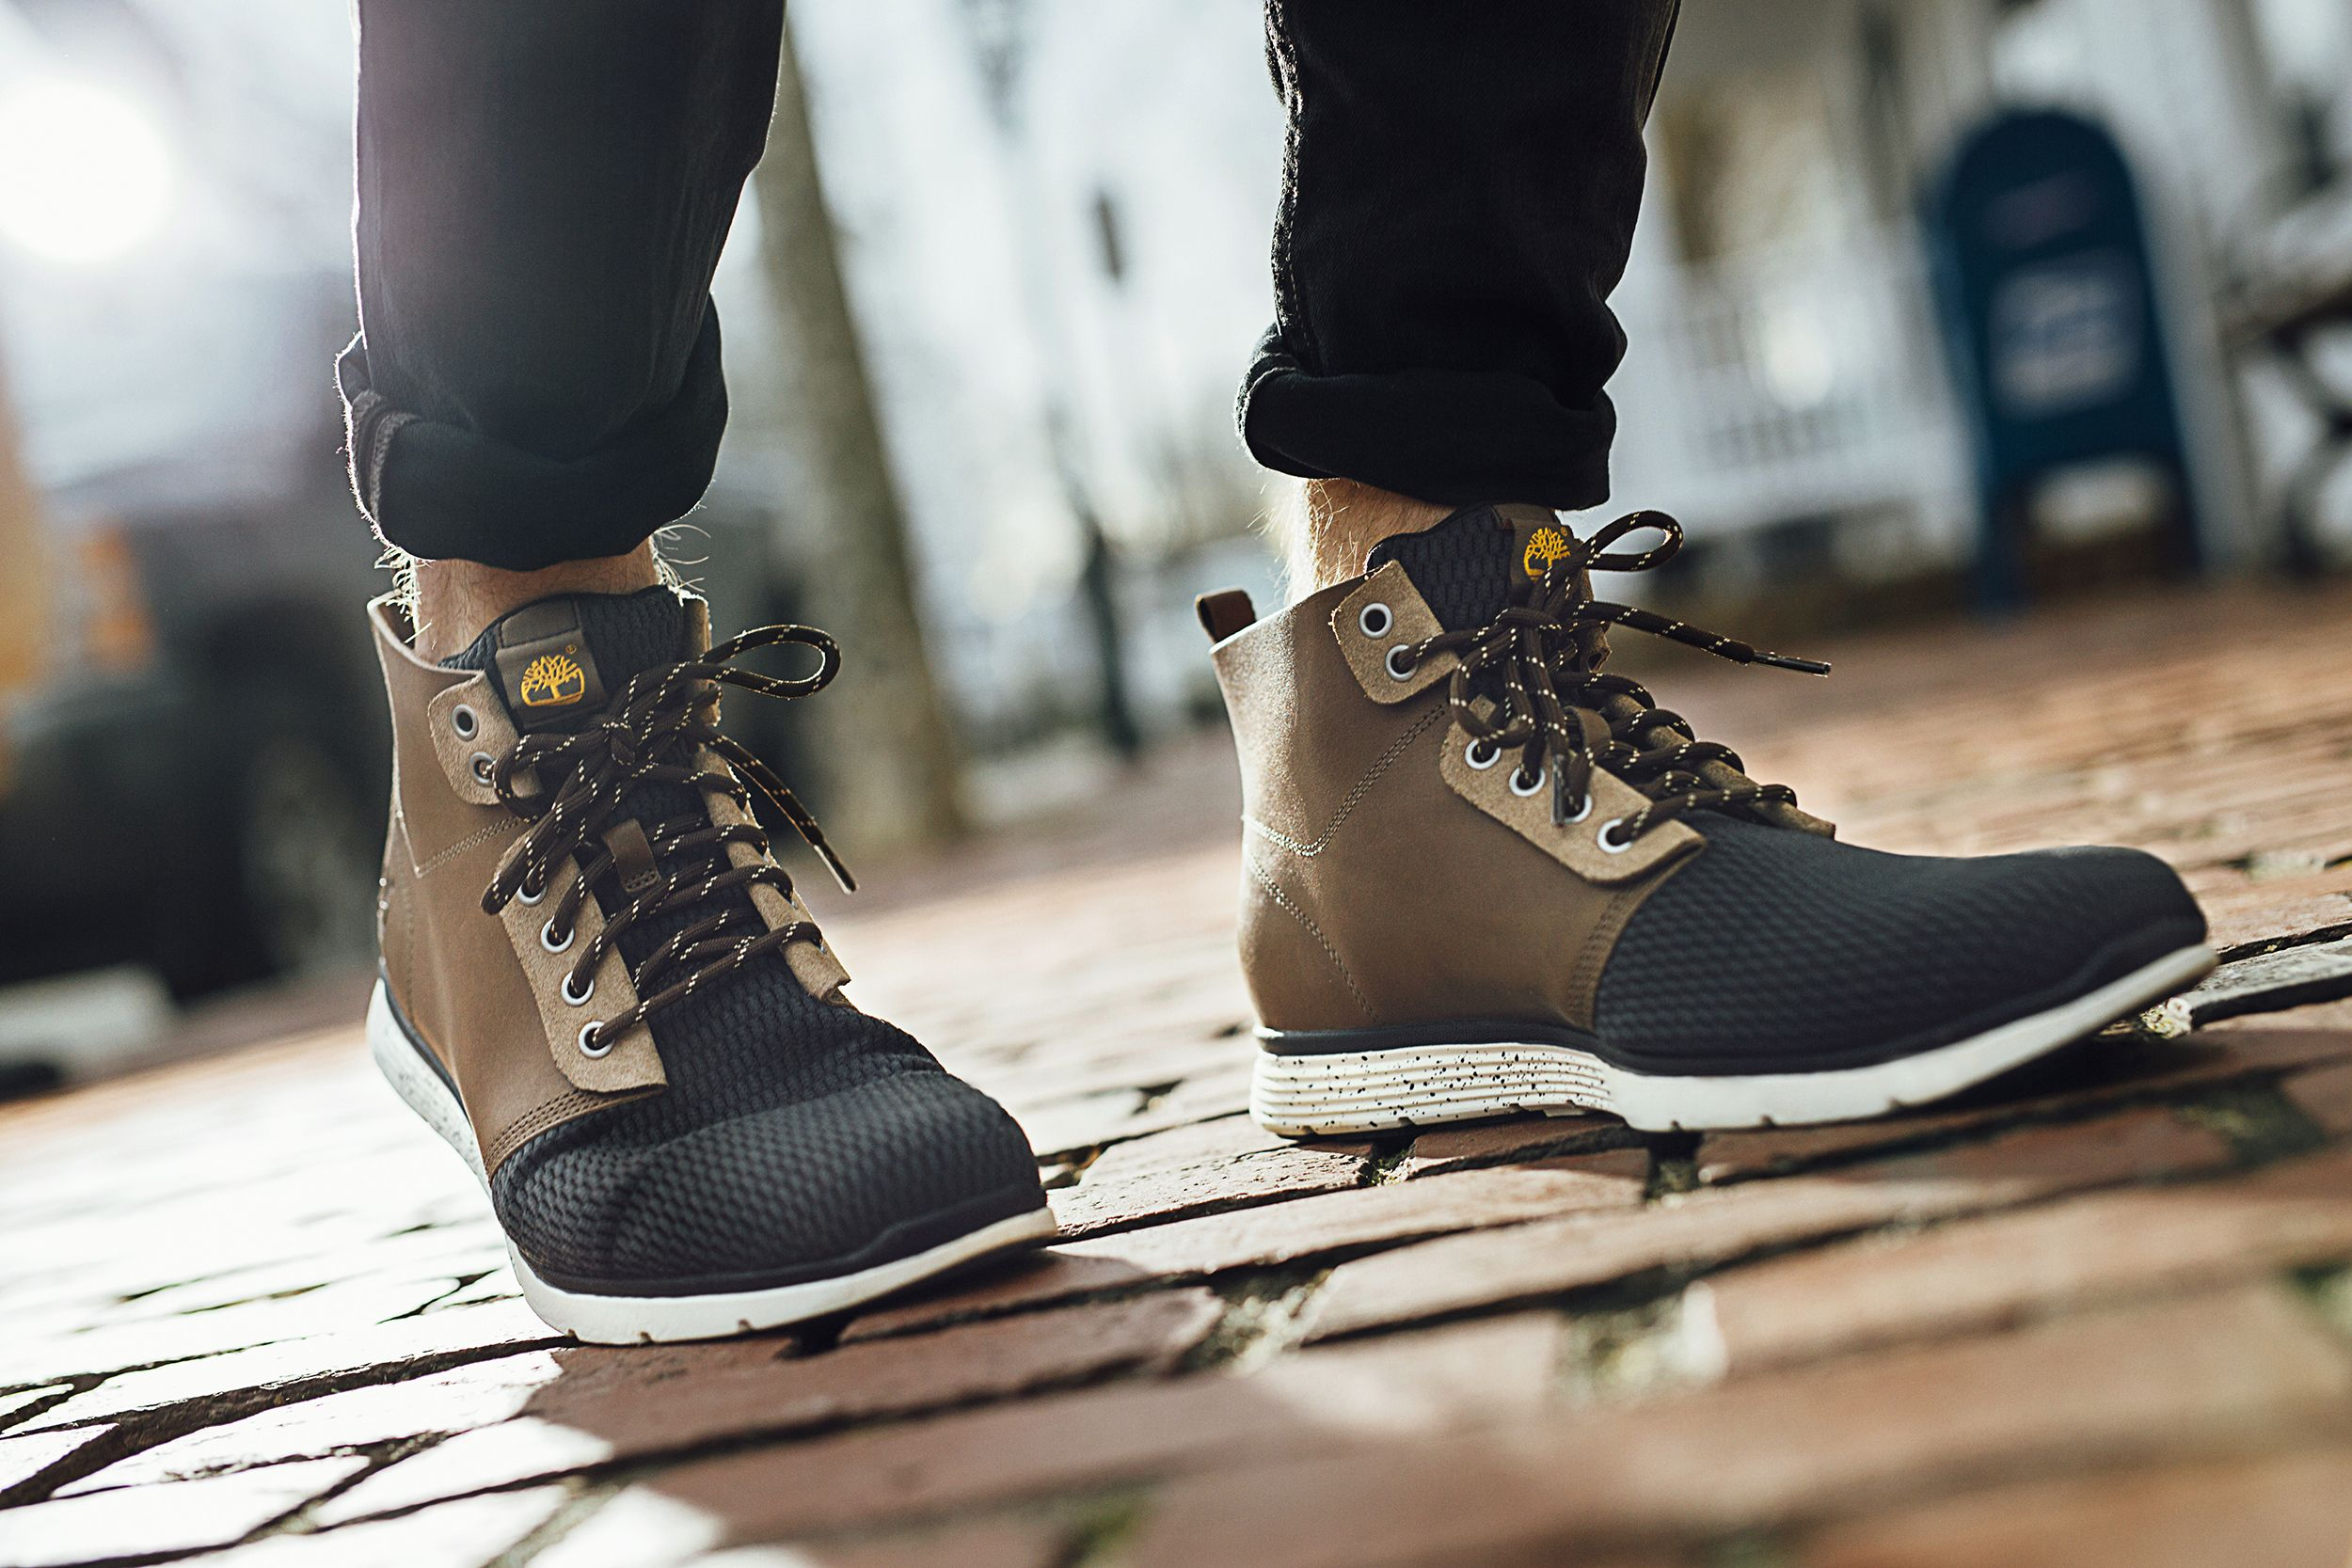 Men's Killington Chukka Sneaker Boots | Boots, Killington